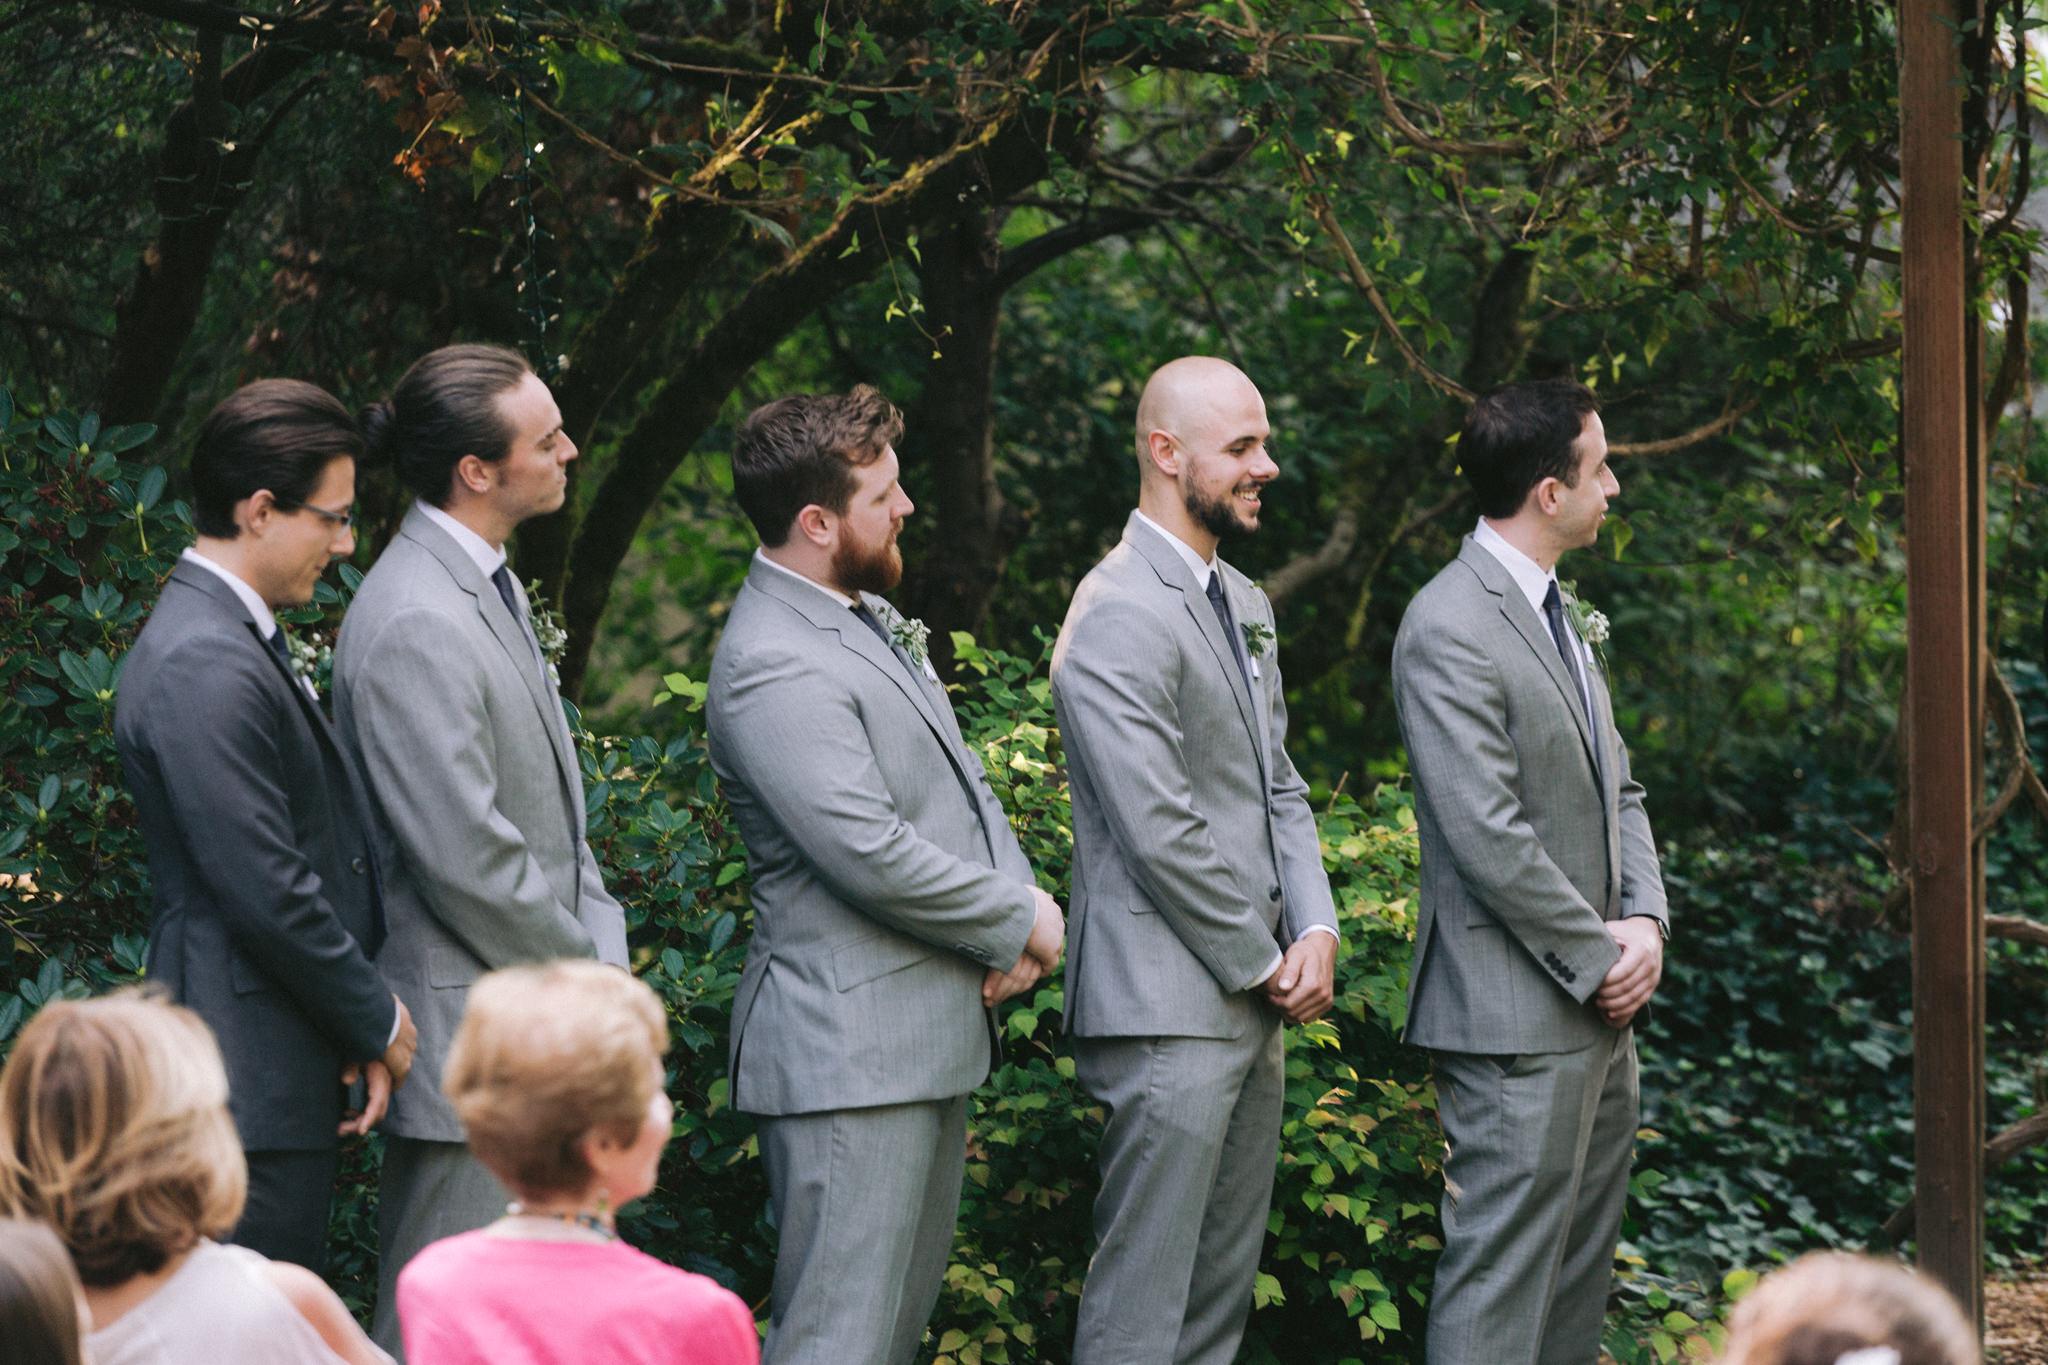 Backyard-Bainbridge-Island-Wedding-Alycia-Lovell-Photography-95.JPG